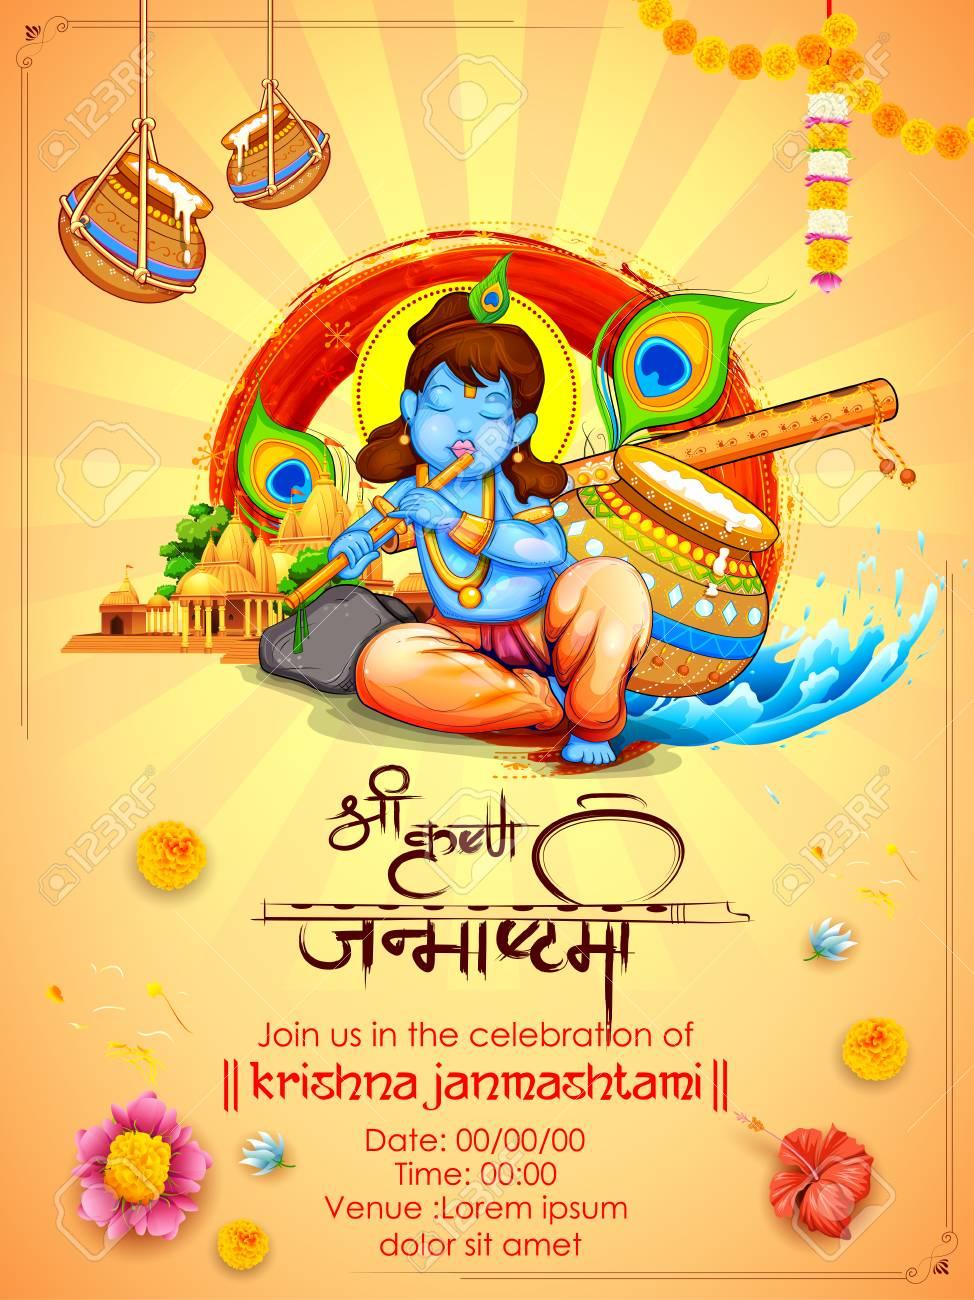 Lord Krishna In Happy Janmashtami Festival Of India Illustration